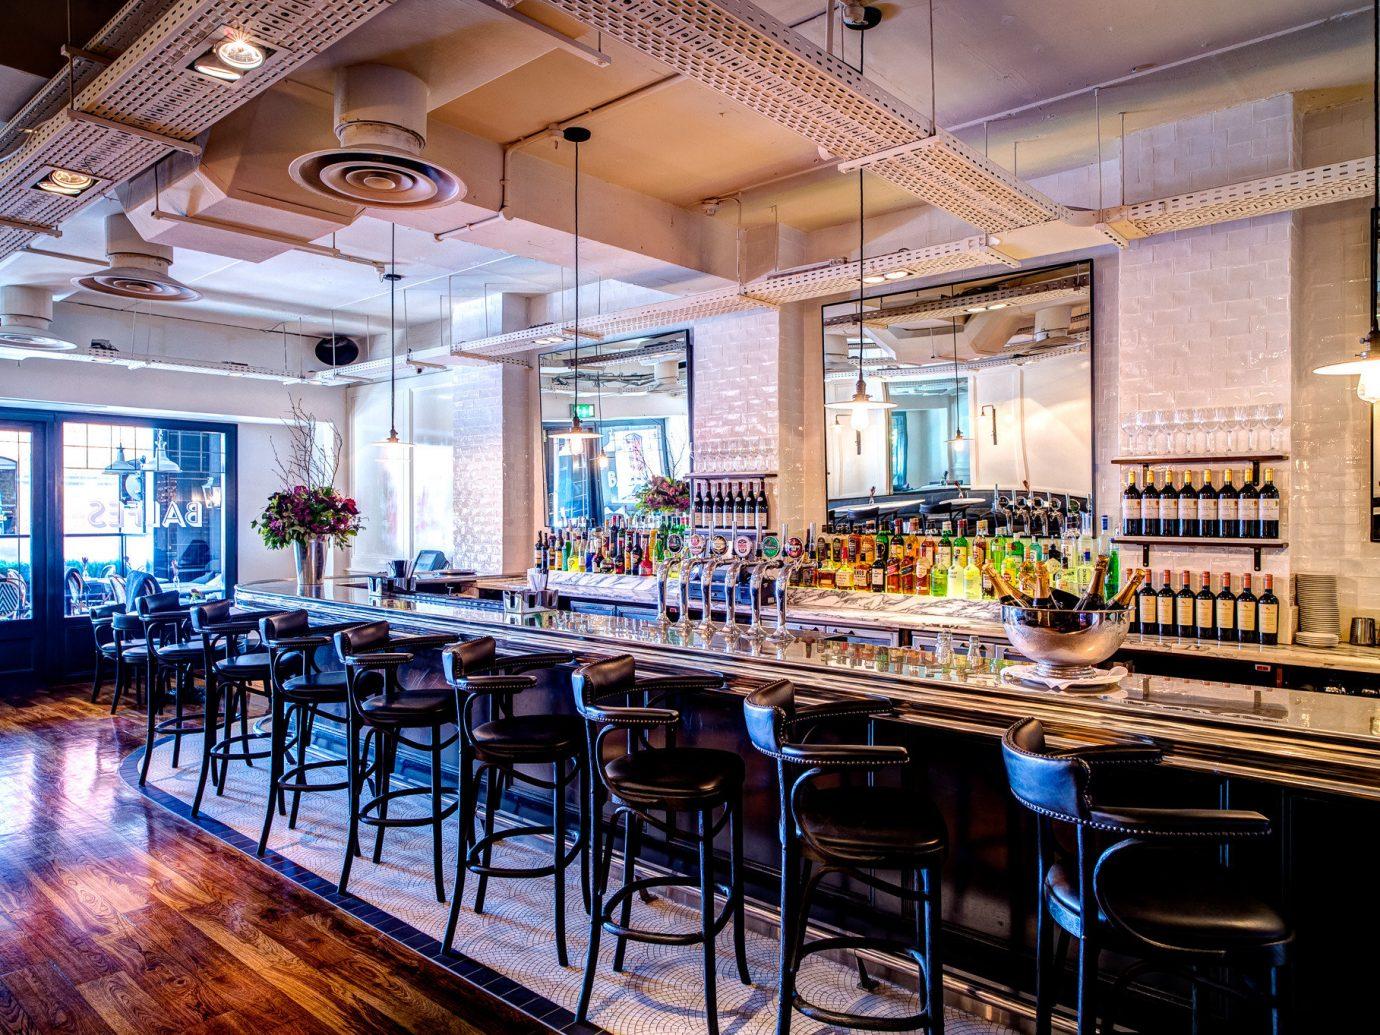 Dublin Hotels Ireland indoor floor table ceiling restaurant interior design Bar café Lobby furniture several